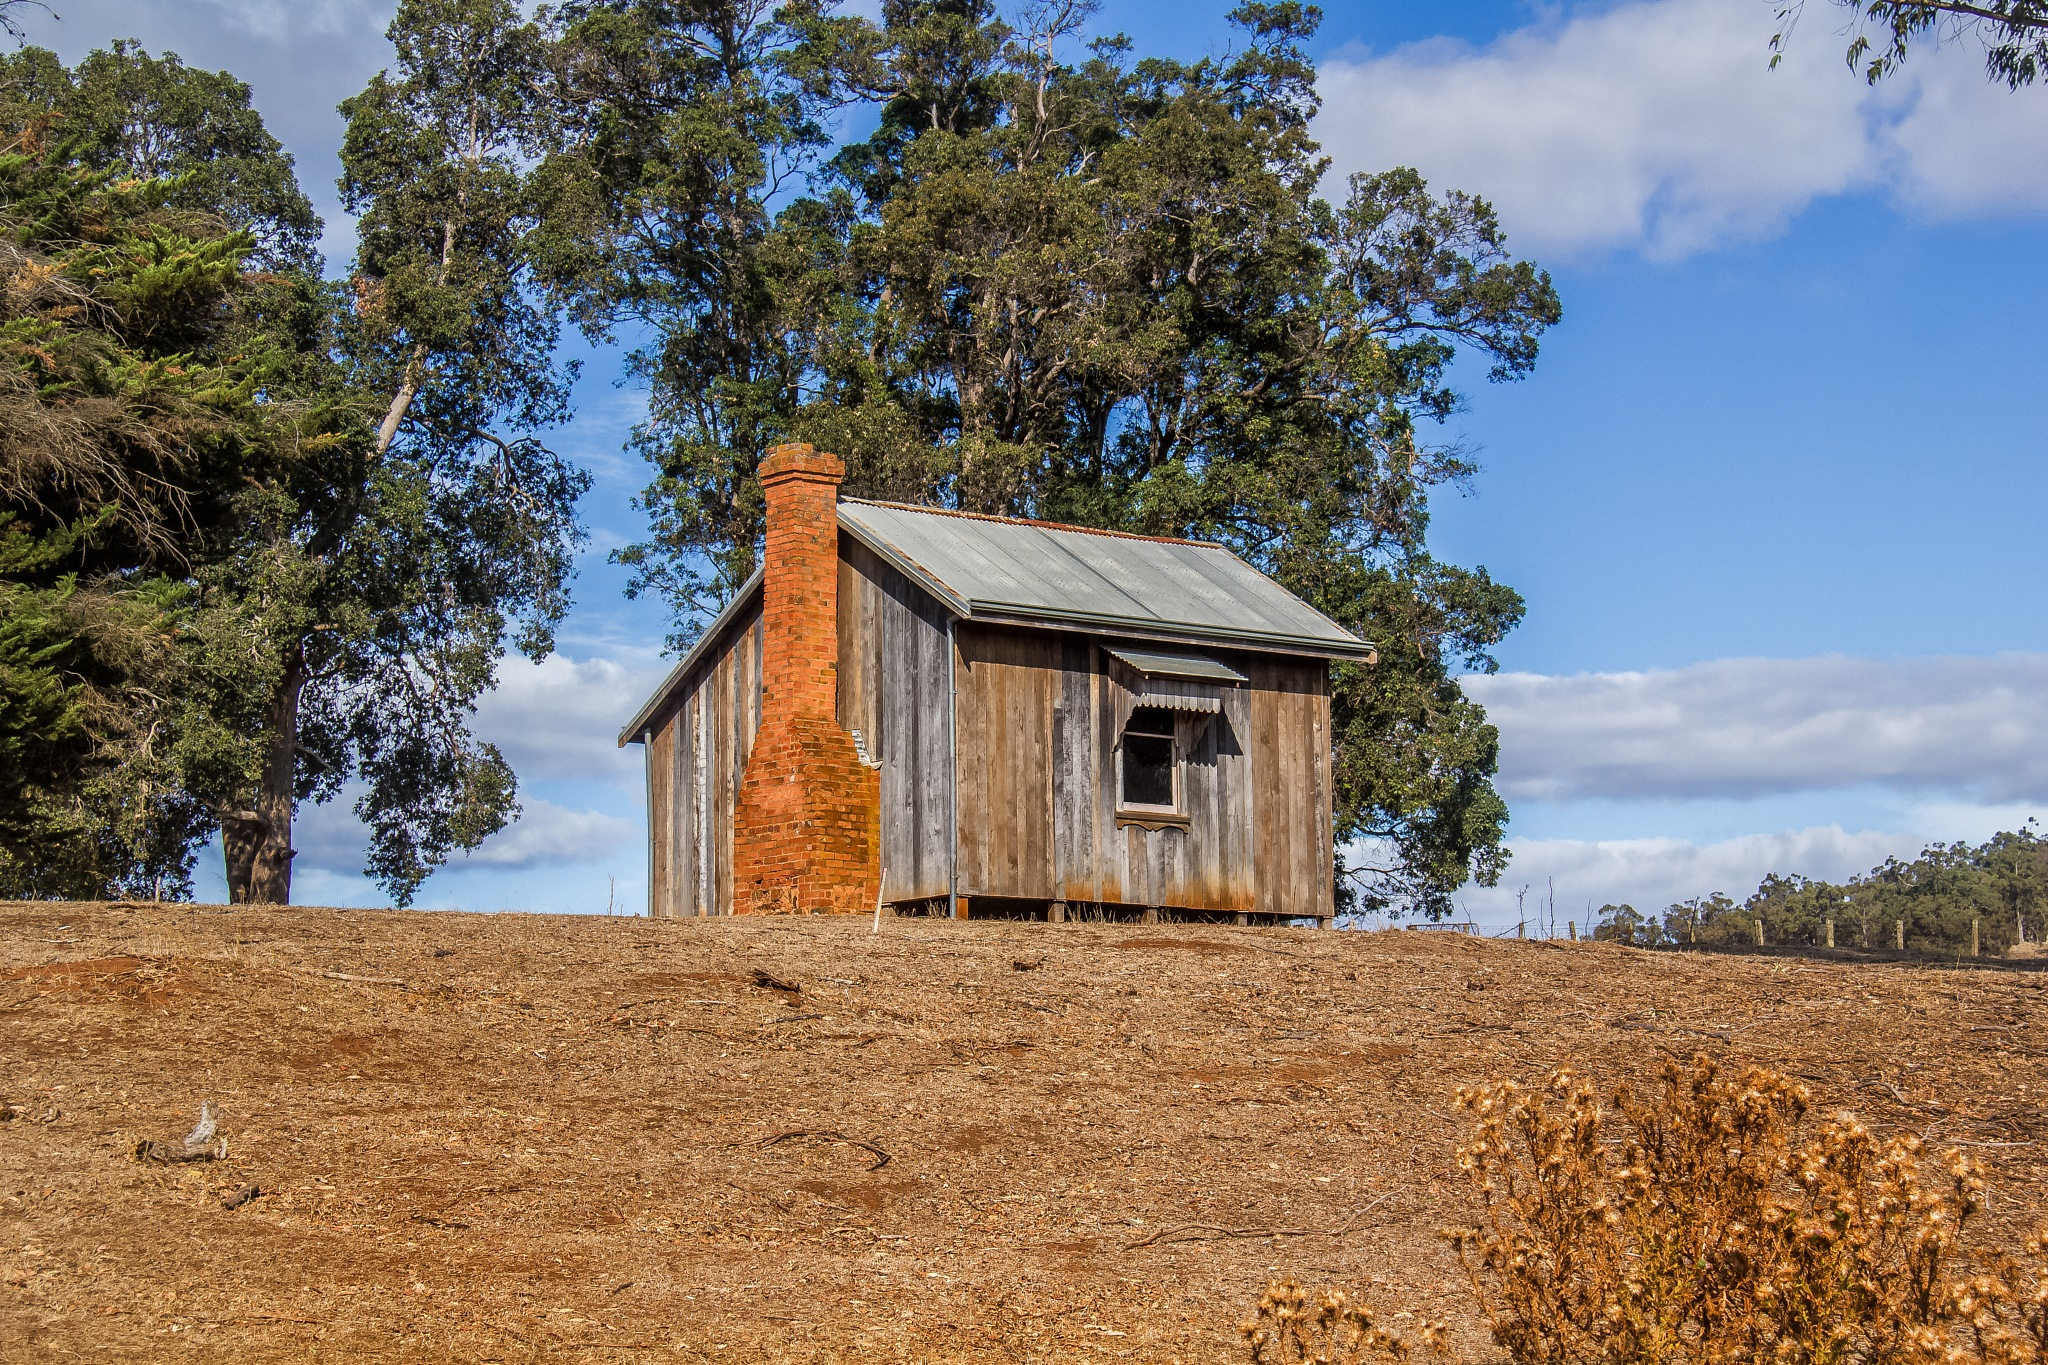 Old rural  School house 2 by LyndaRealmshift